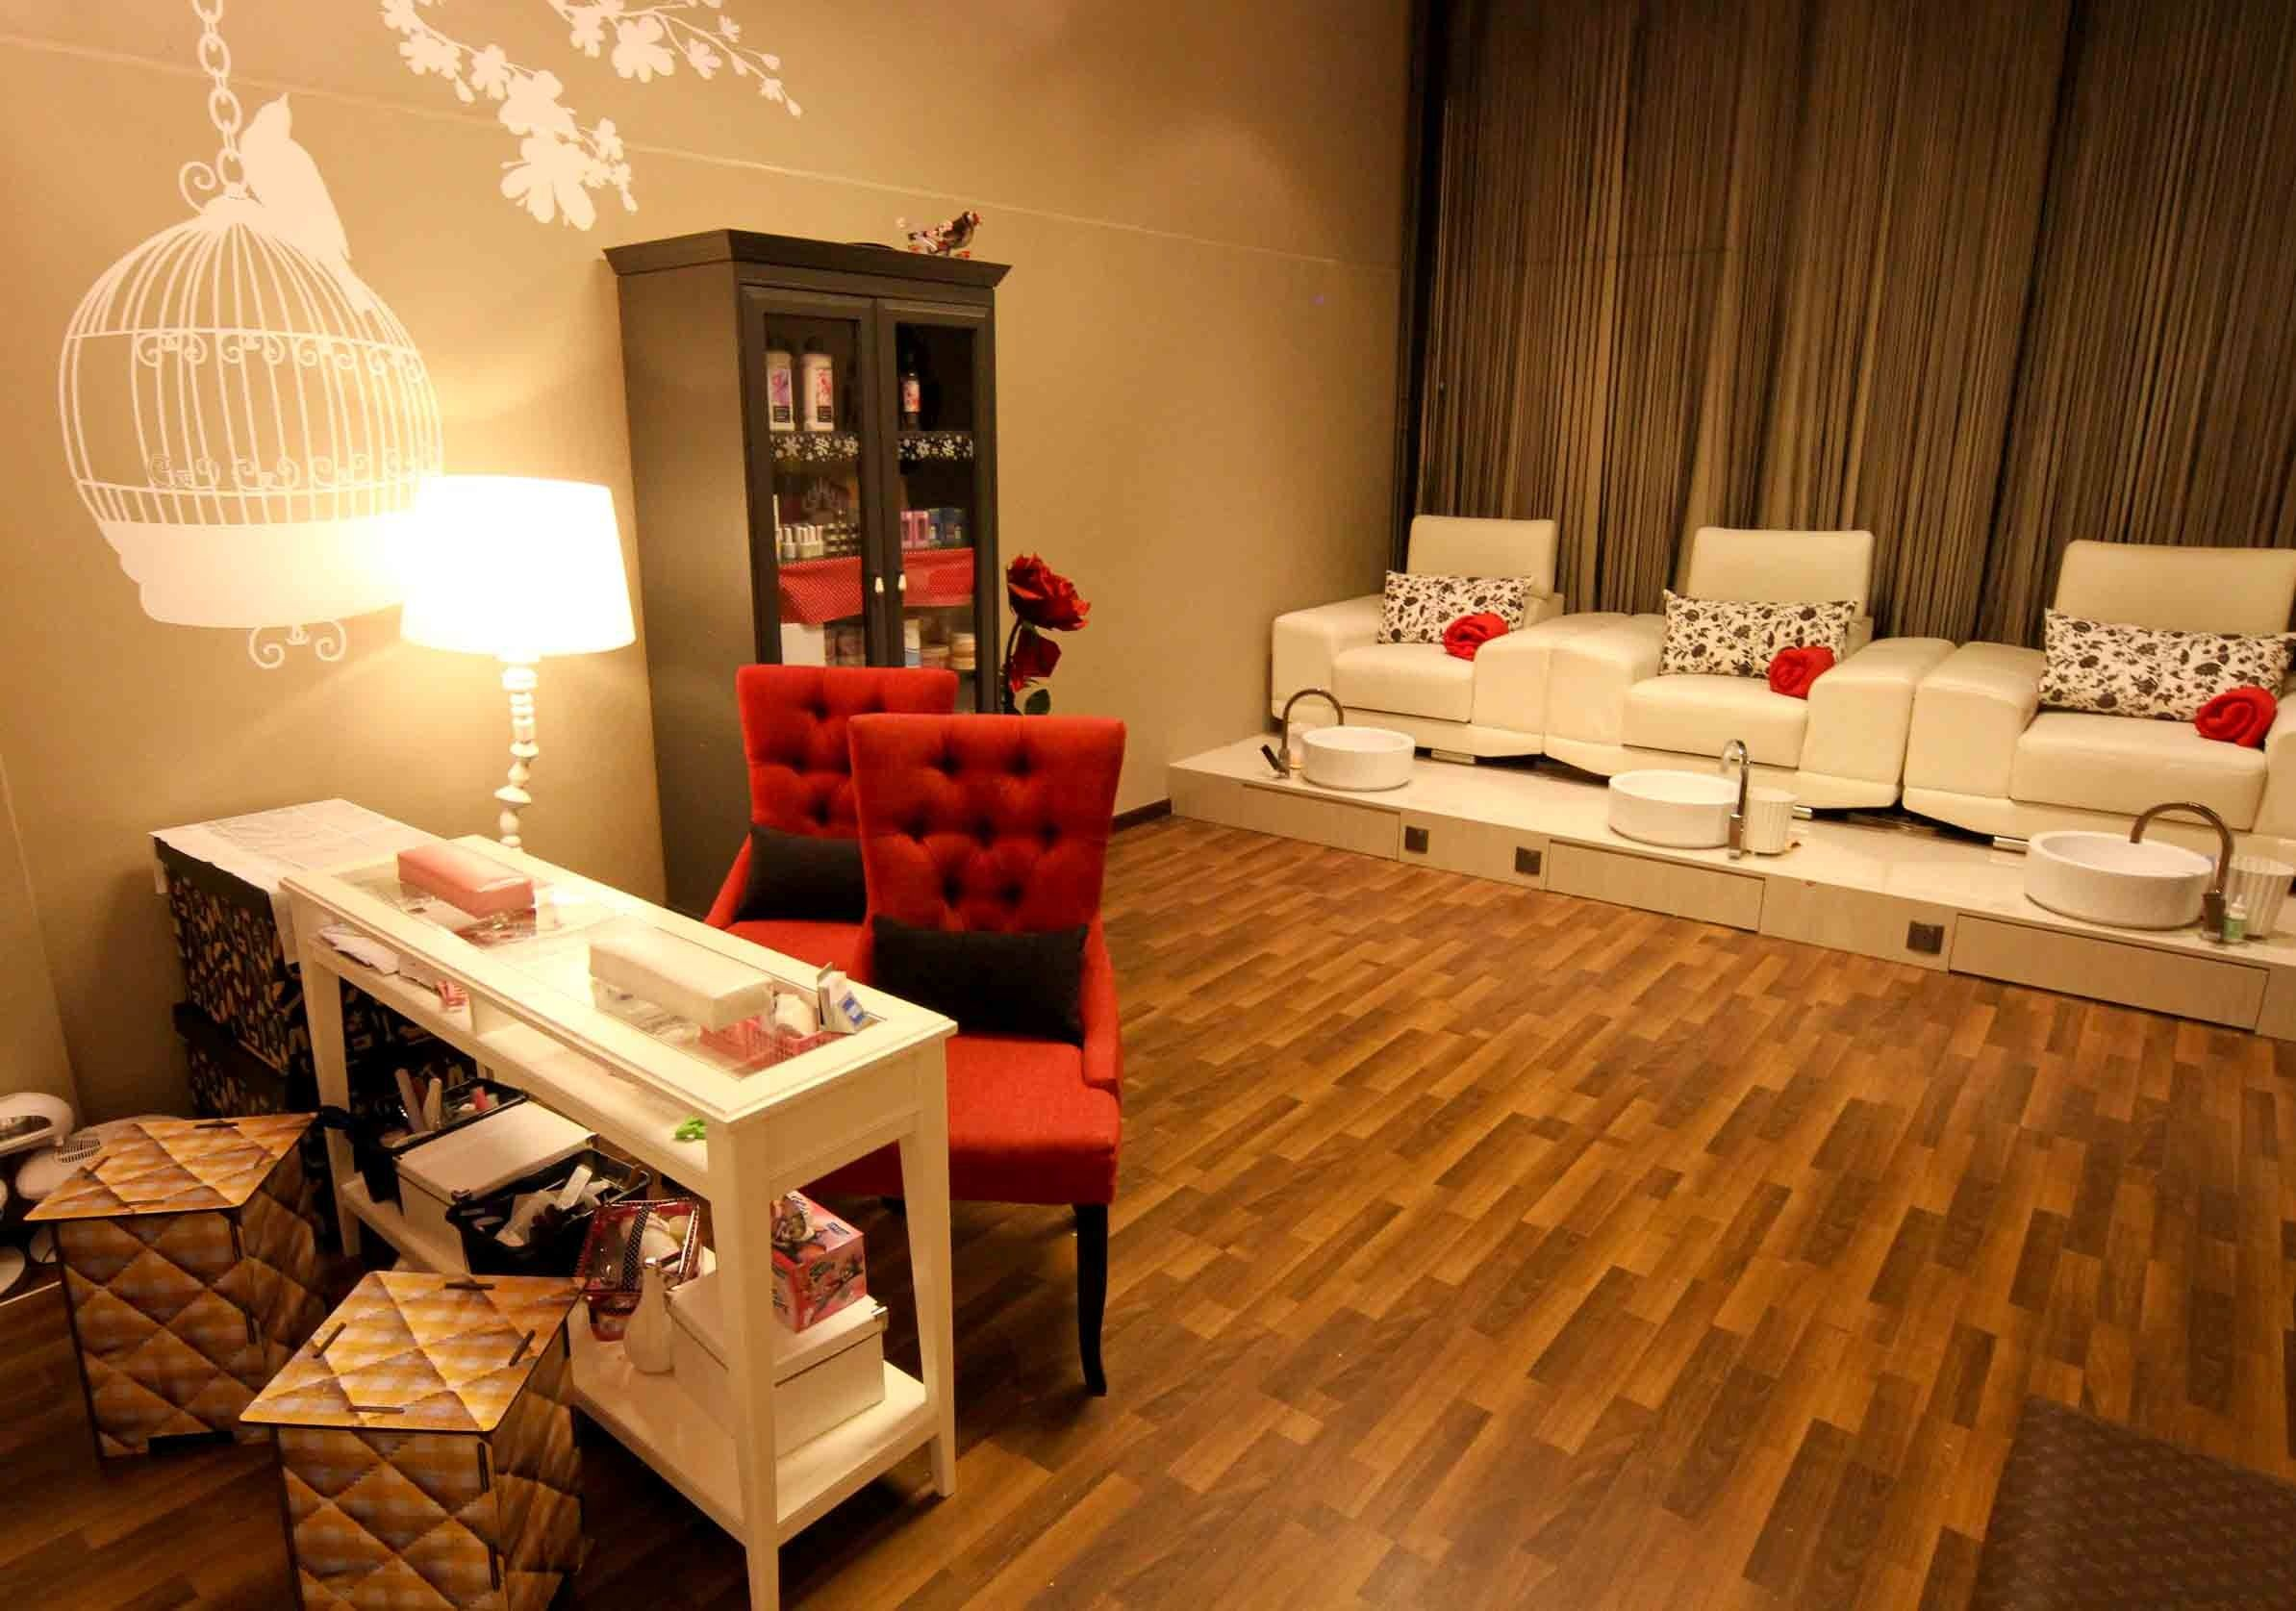 Best 25 Nail salon decor ideas on Pinterest  Beauty salon decor Beauty salons and Makeup salon